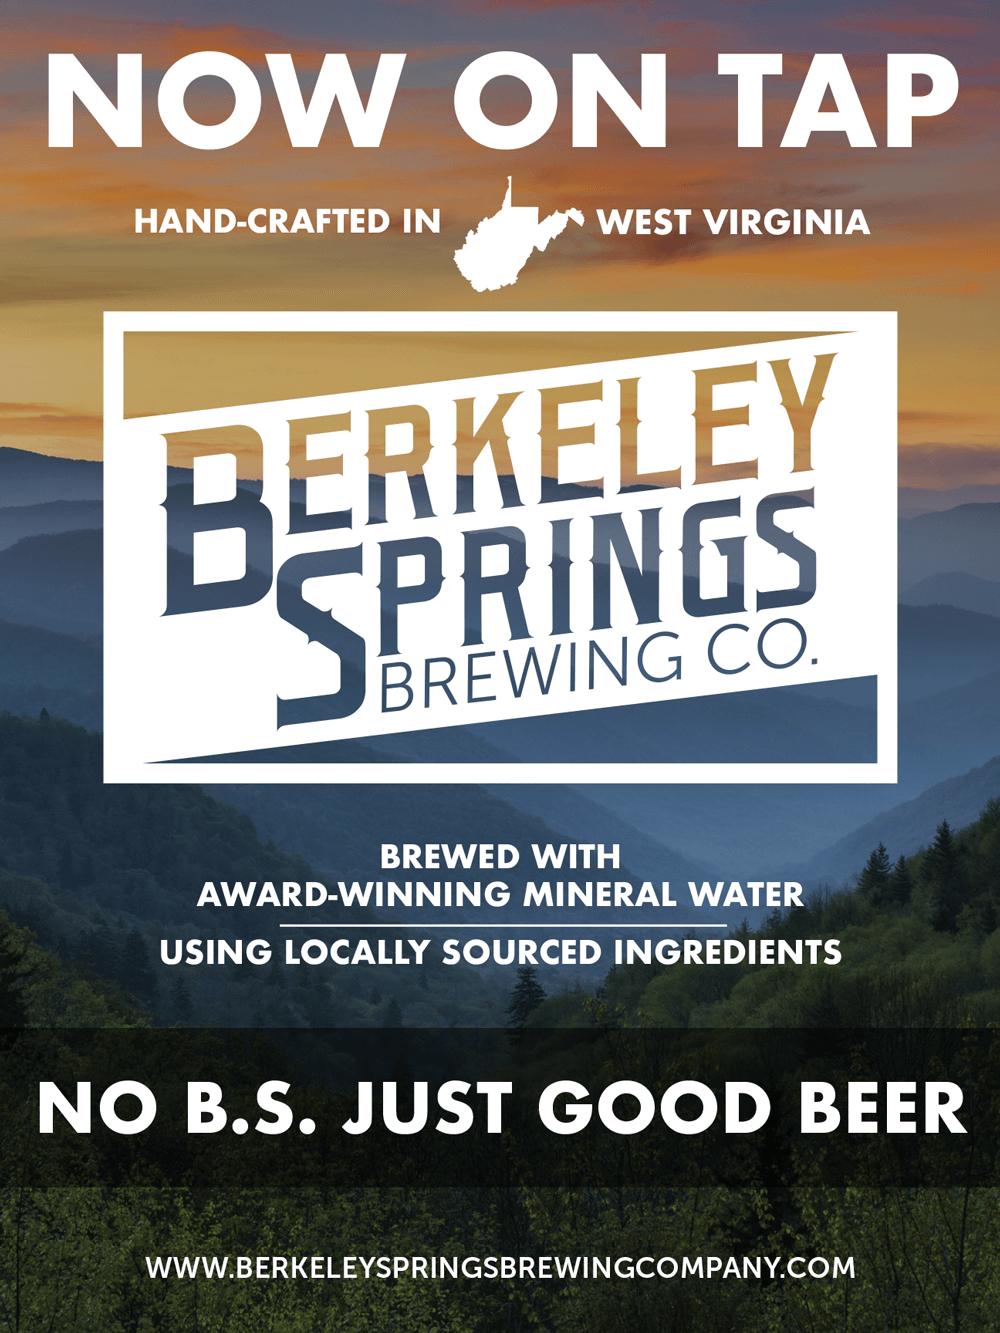 berkeley springs brewing company poster design